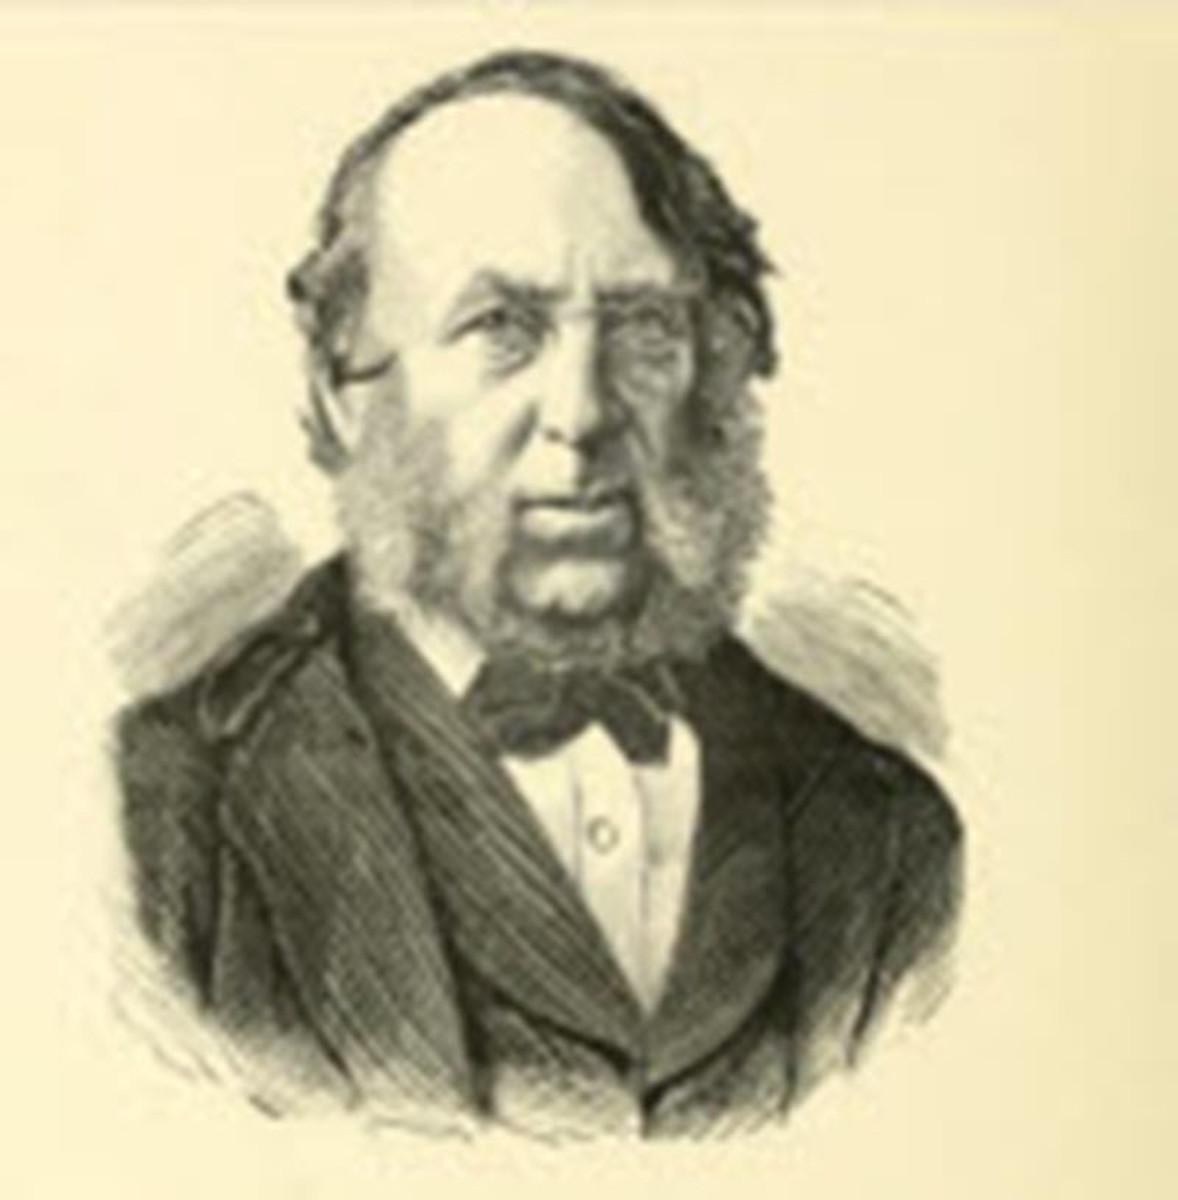 George Cruikshank - A Great Victorian Illustrator